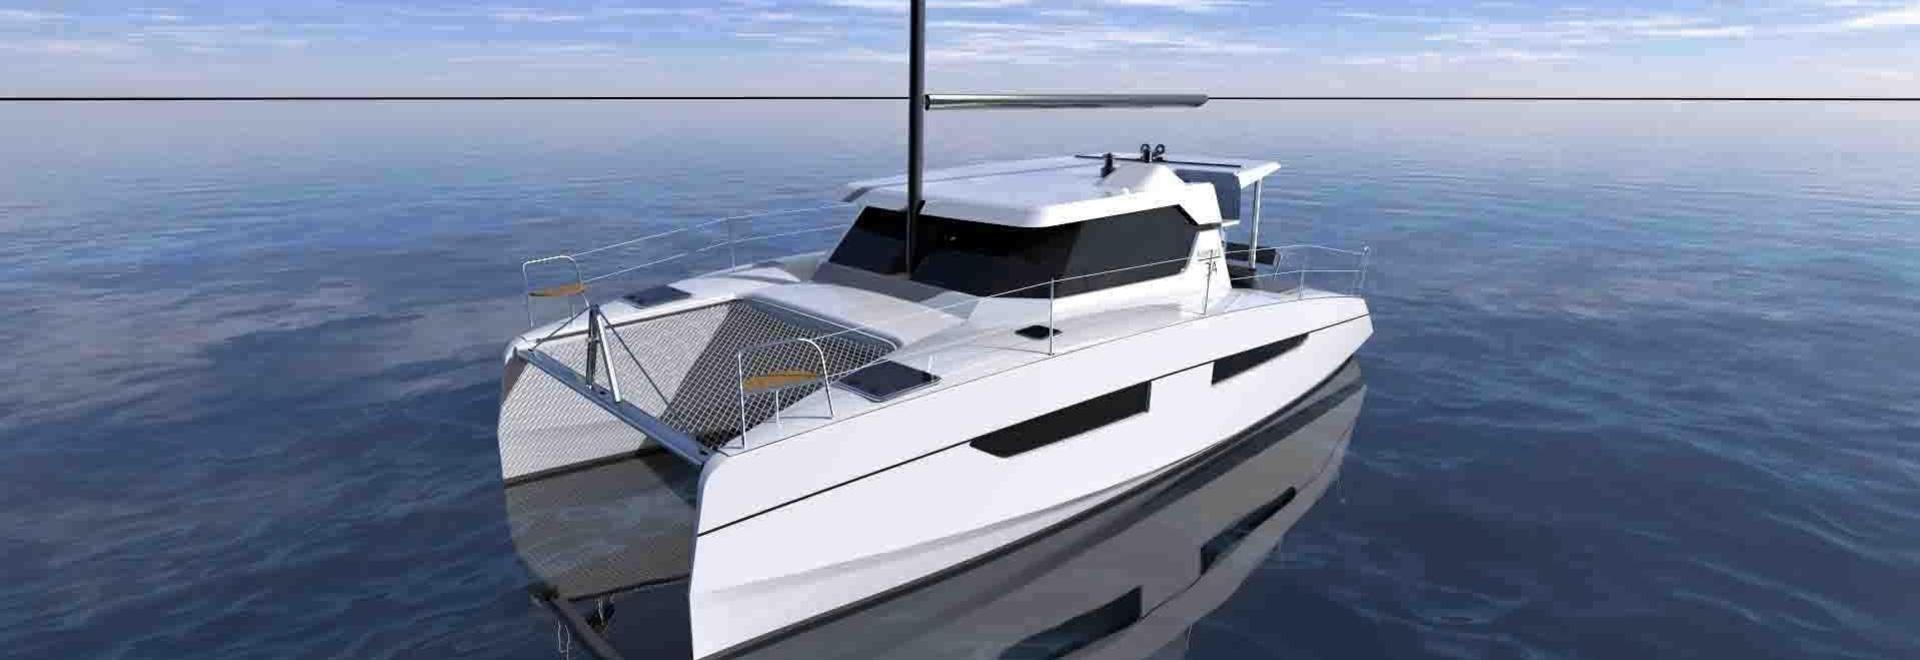 Multihulls: new yacht reviews